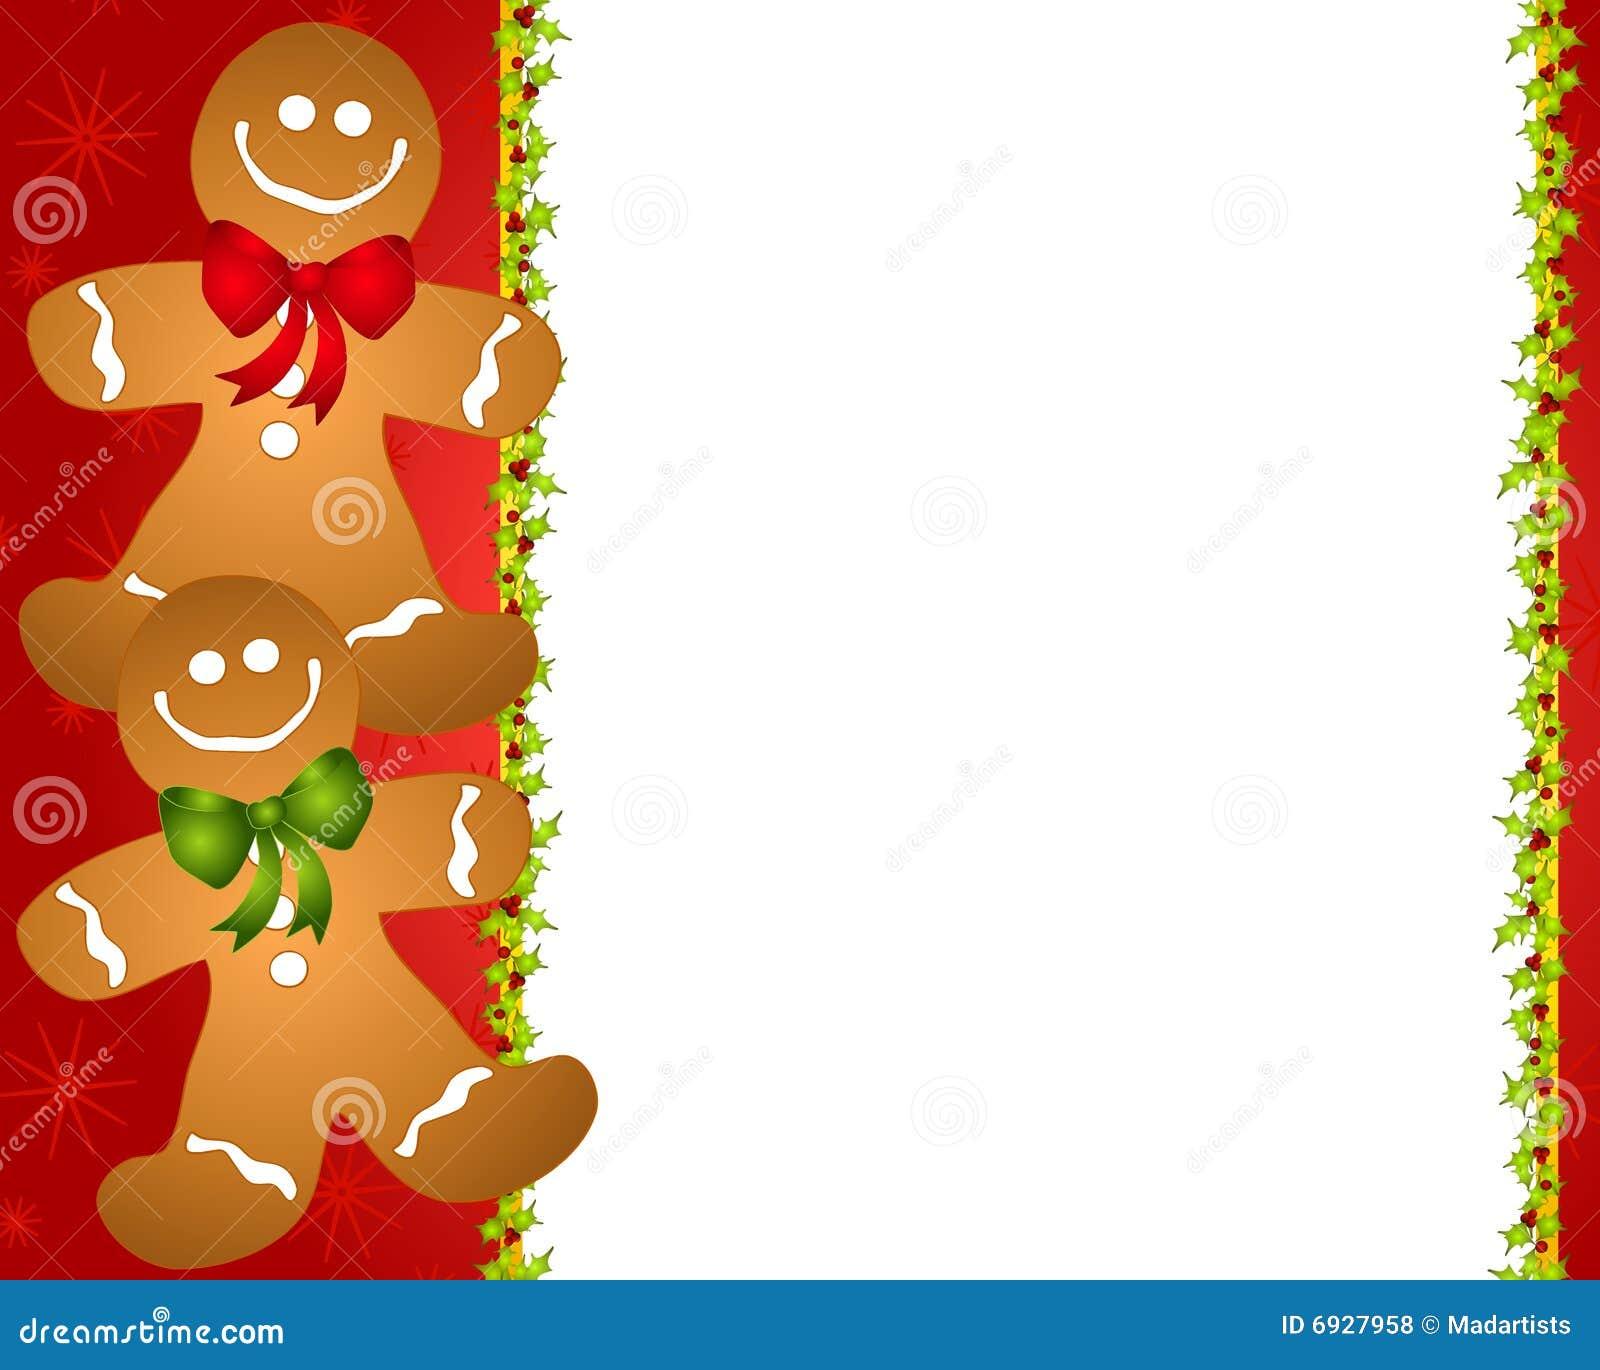 gingerbread man border 2 stock illustration illustration Winter Newsletter Template free winter clip art border for word